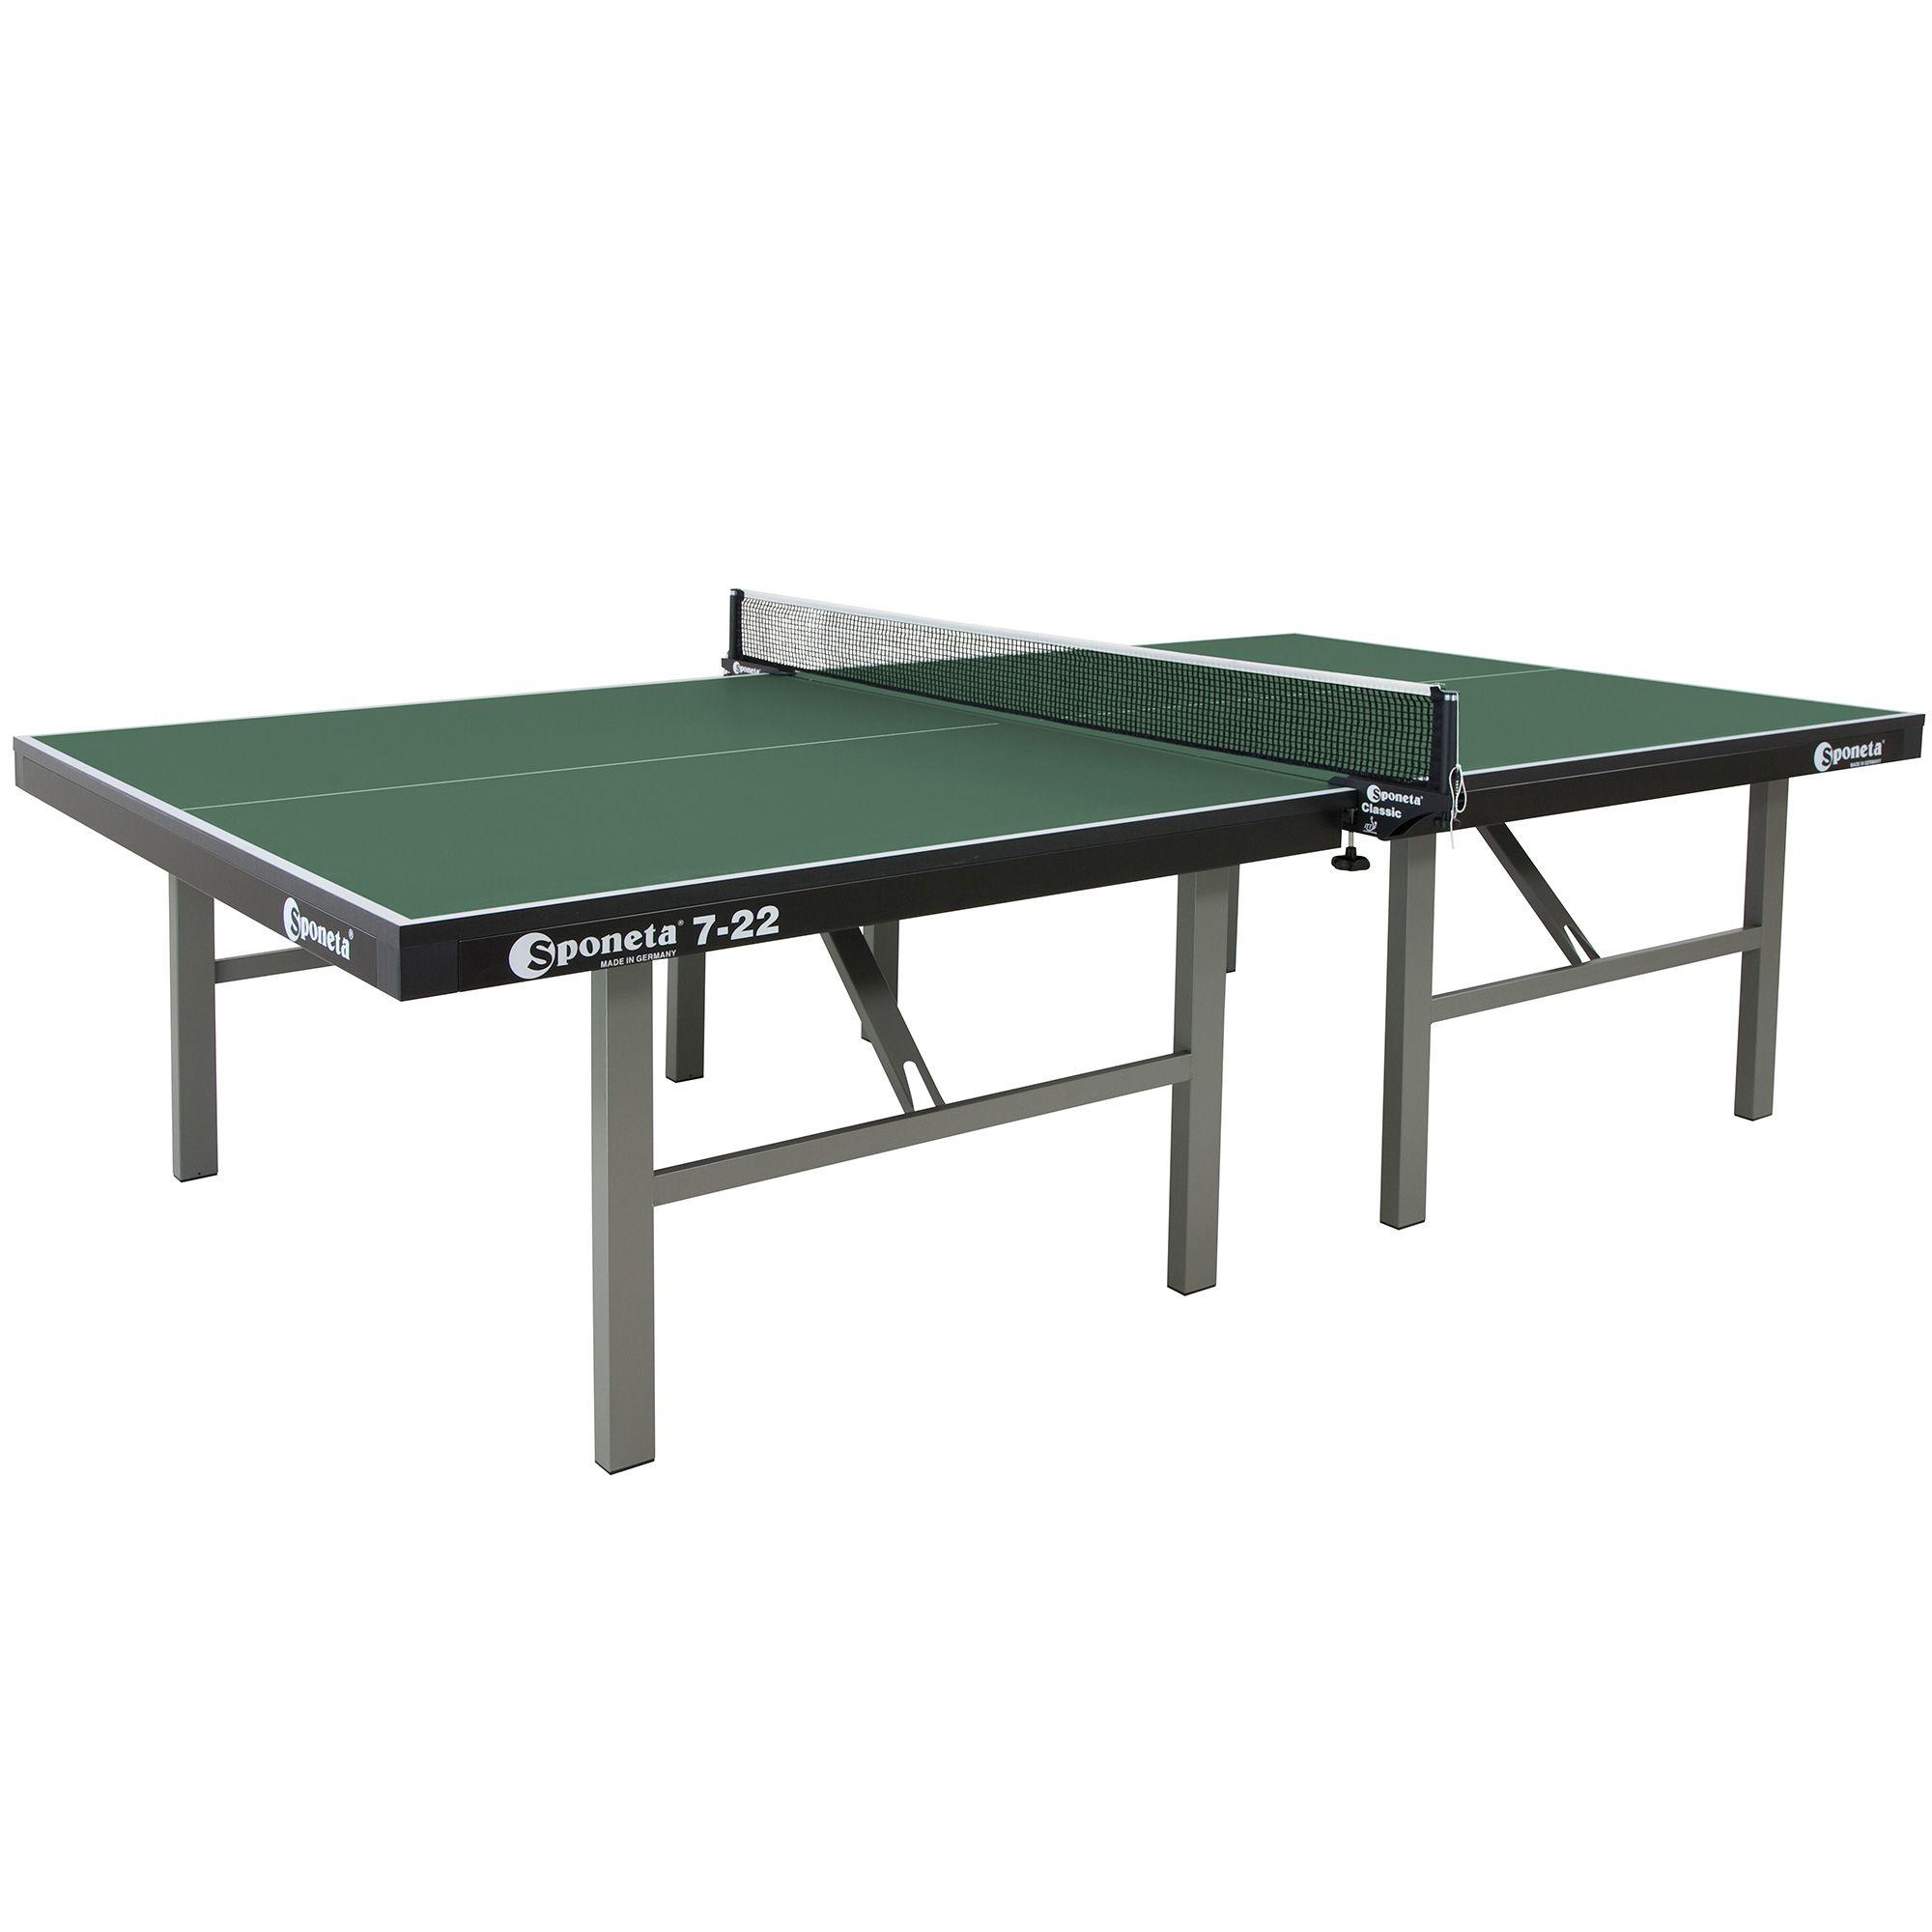 Sponeta pro competition indoor table tennis table - Sponeta table tennis table ...